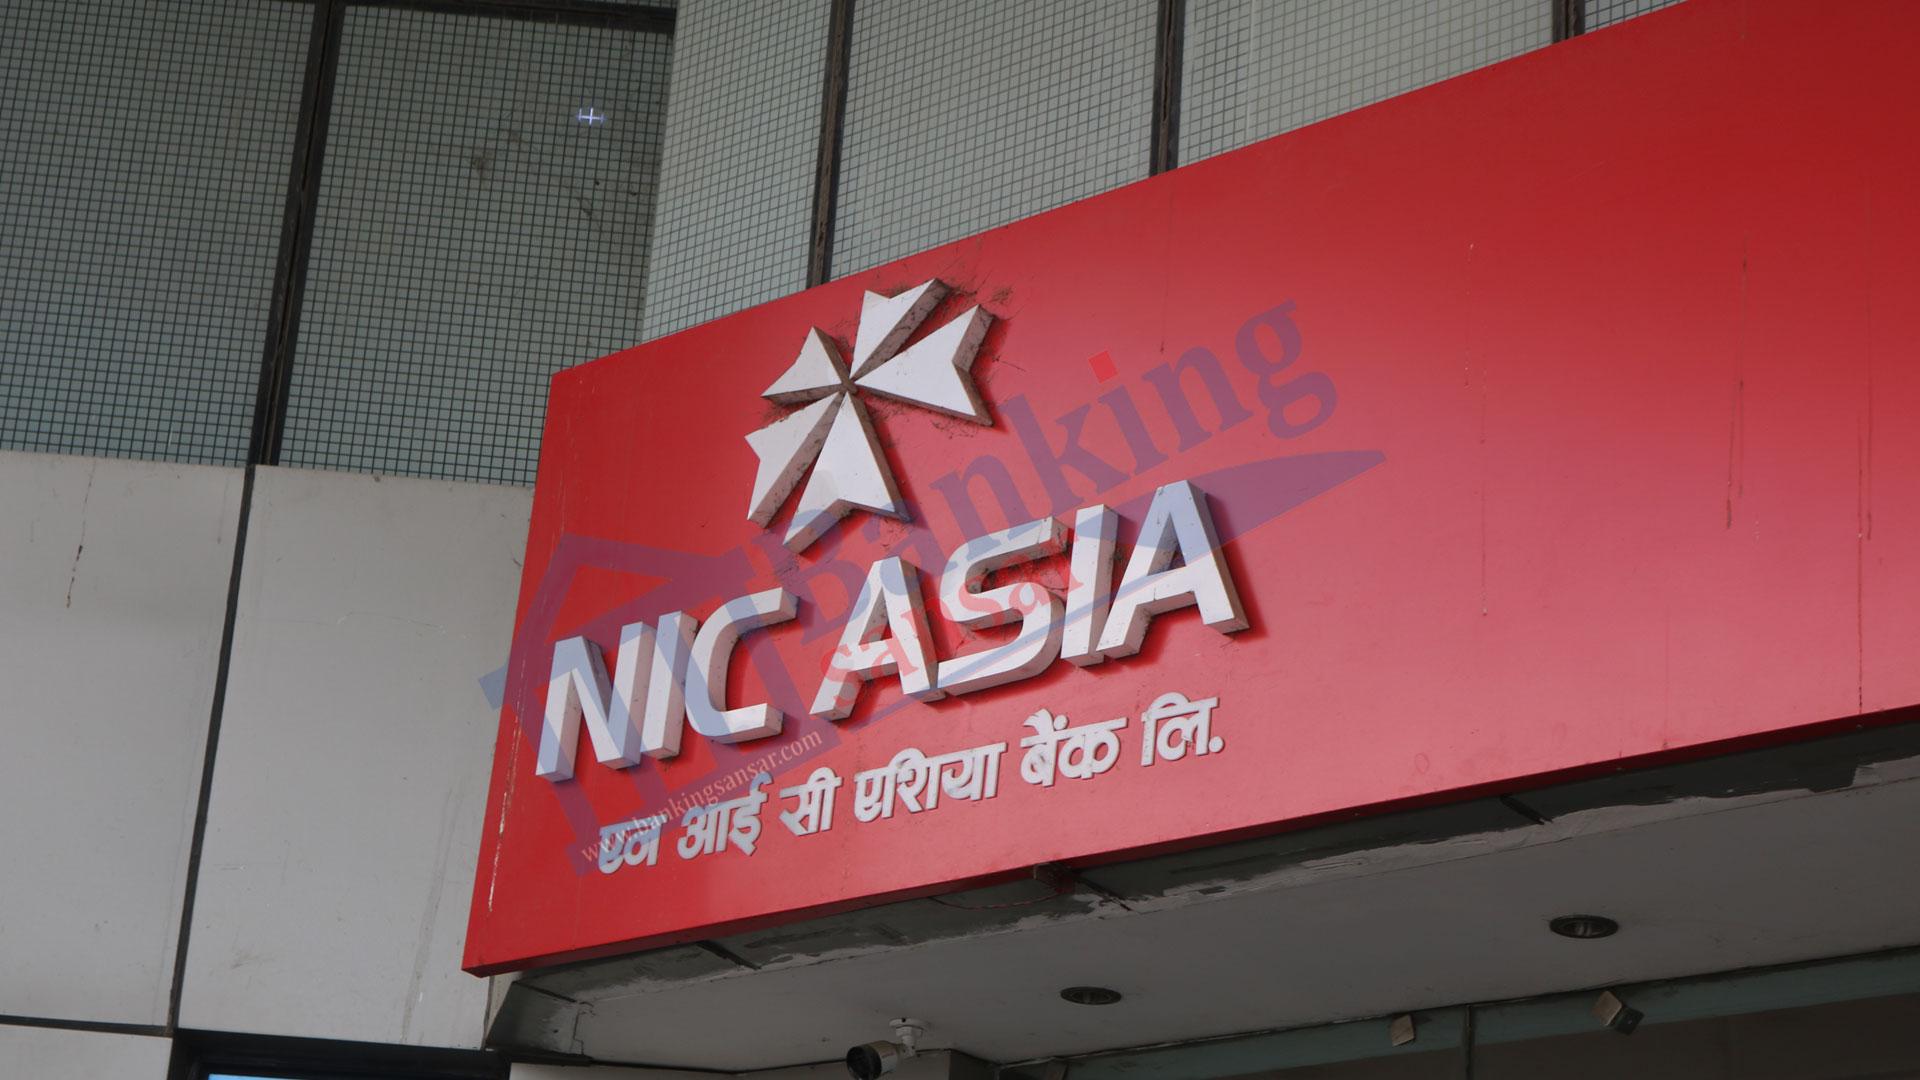 Nic Asia Bank